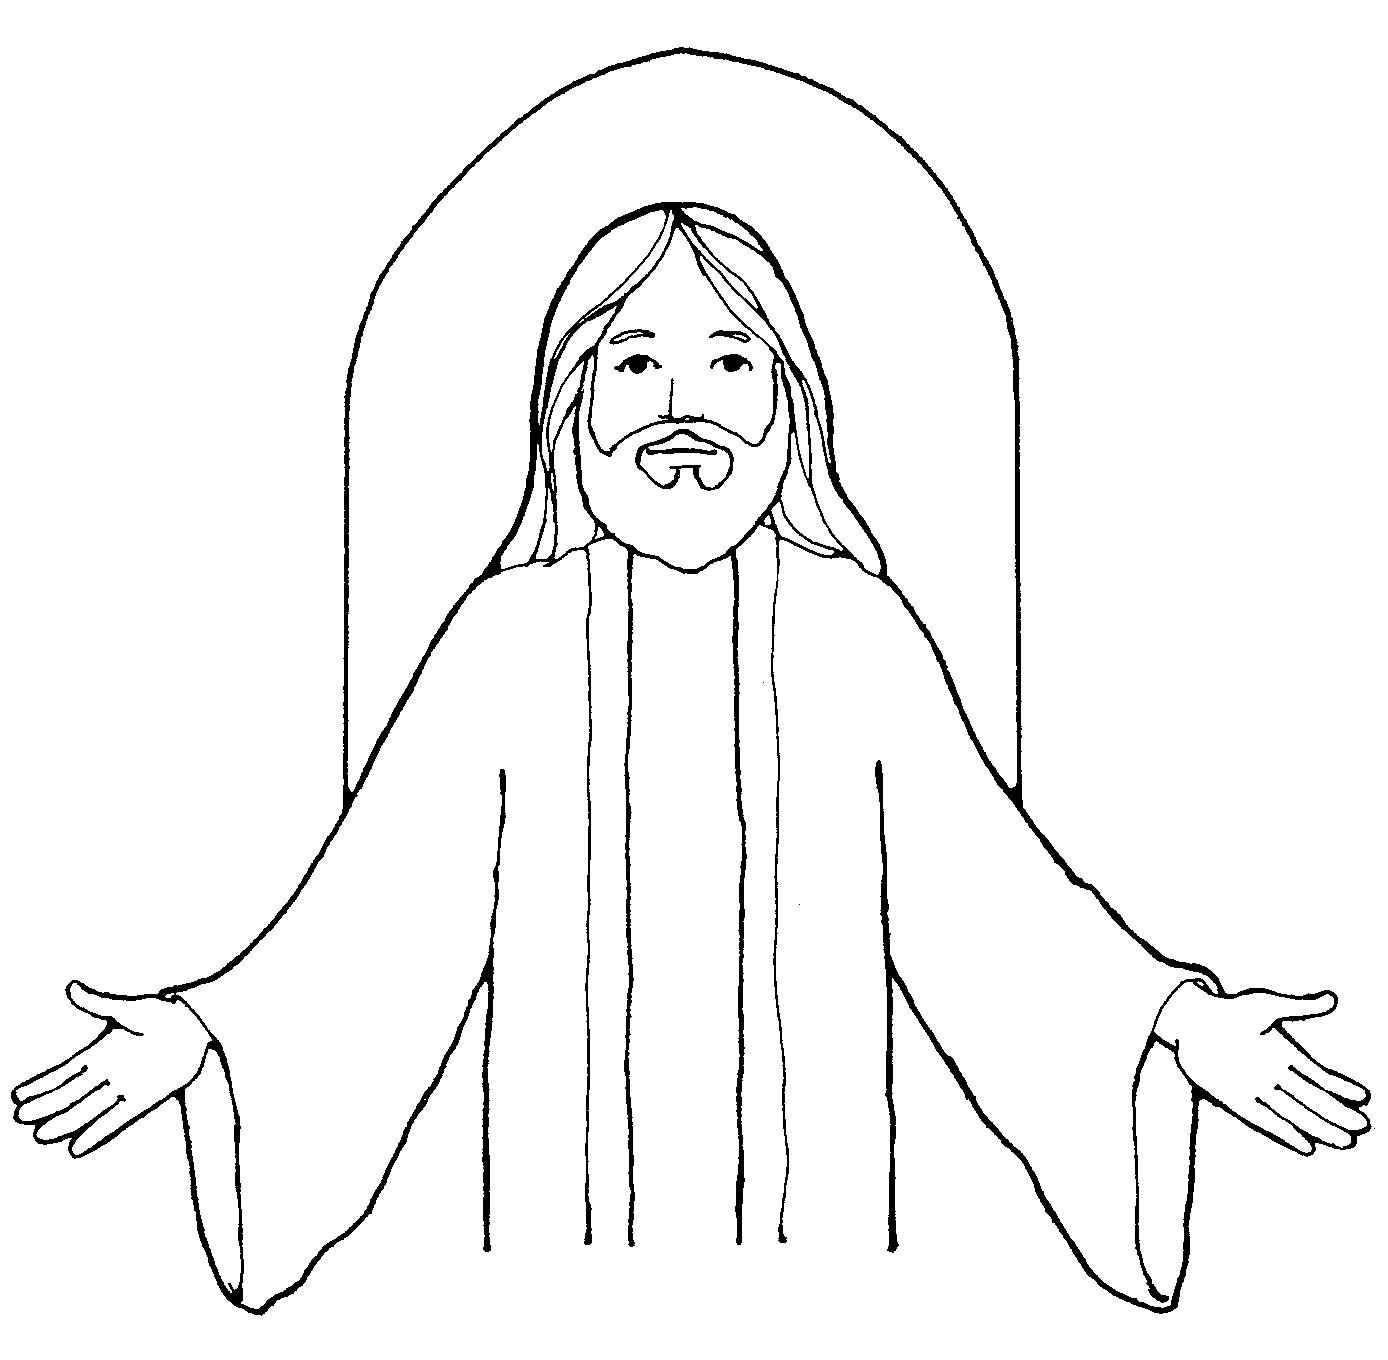 Jesus clipart black and white full body vector black and white library Free Jesus Black And White, Download Free Clip Art, Free Clip Art on ... vector black and white library